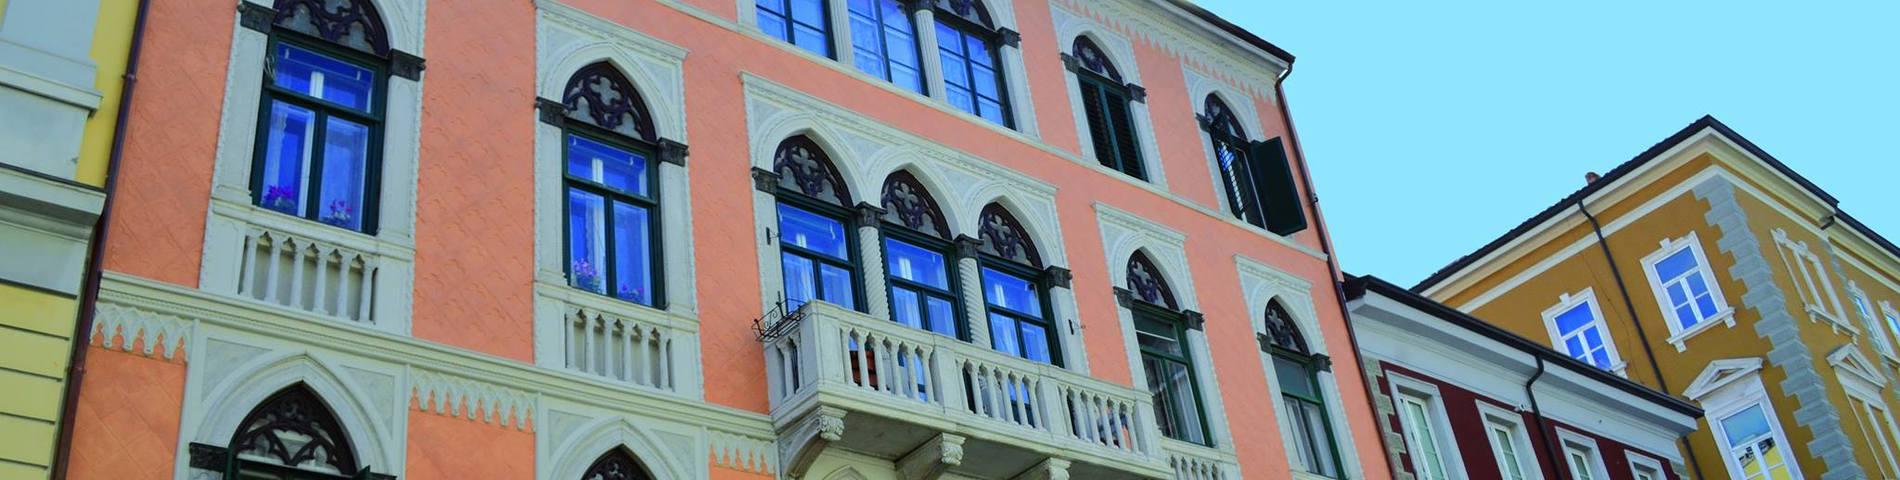 Piccola Università Italiana - Le Venezie kép 1